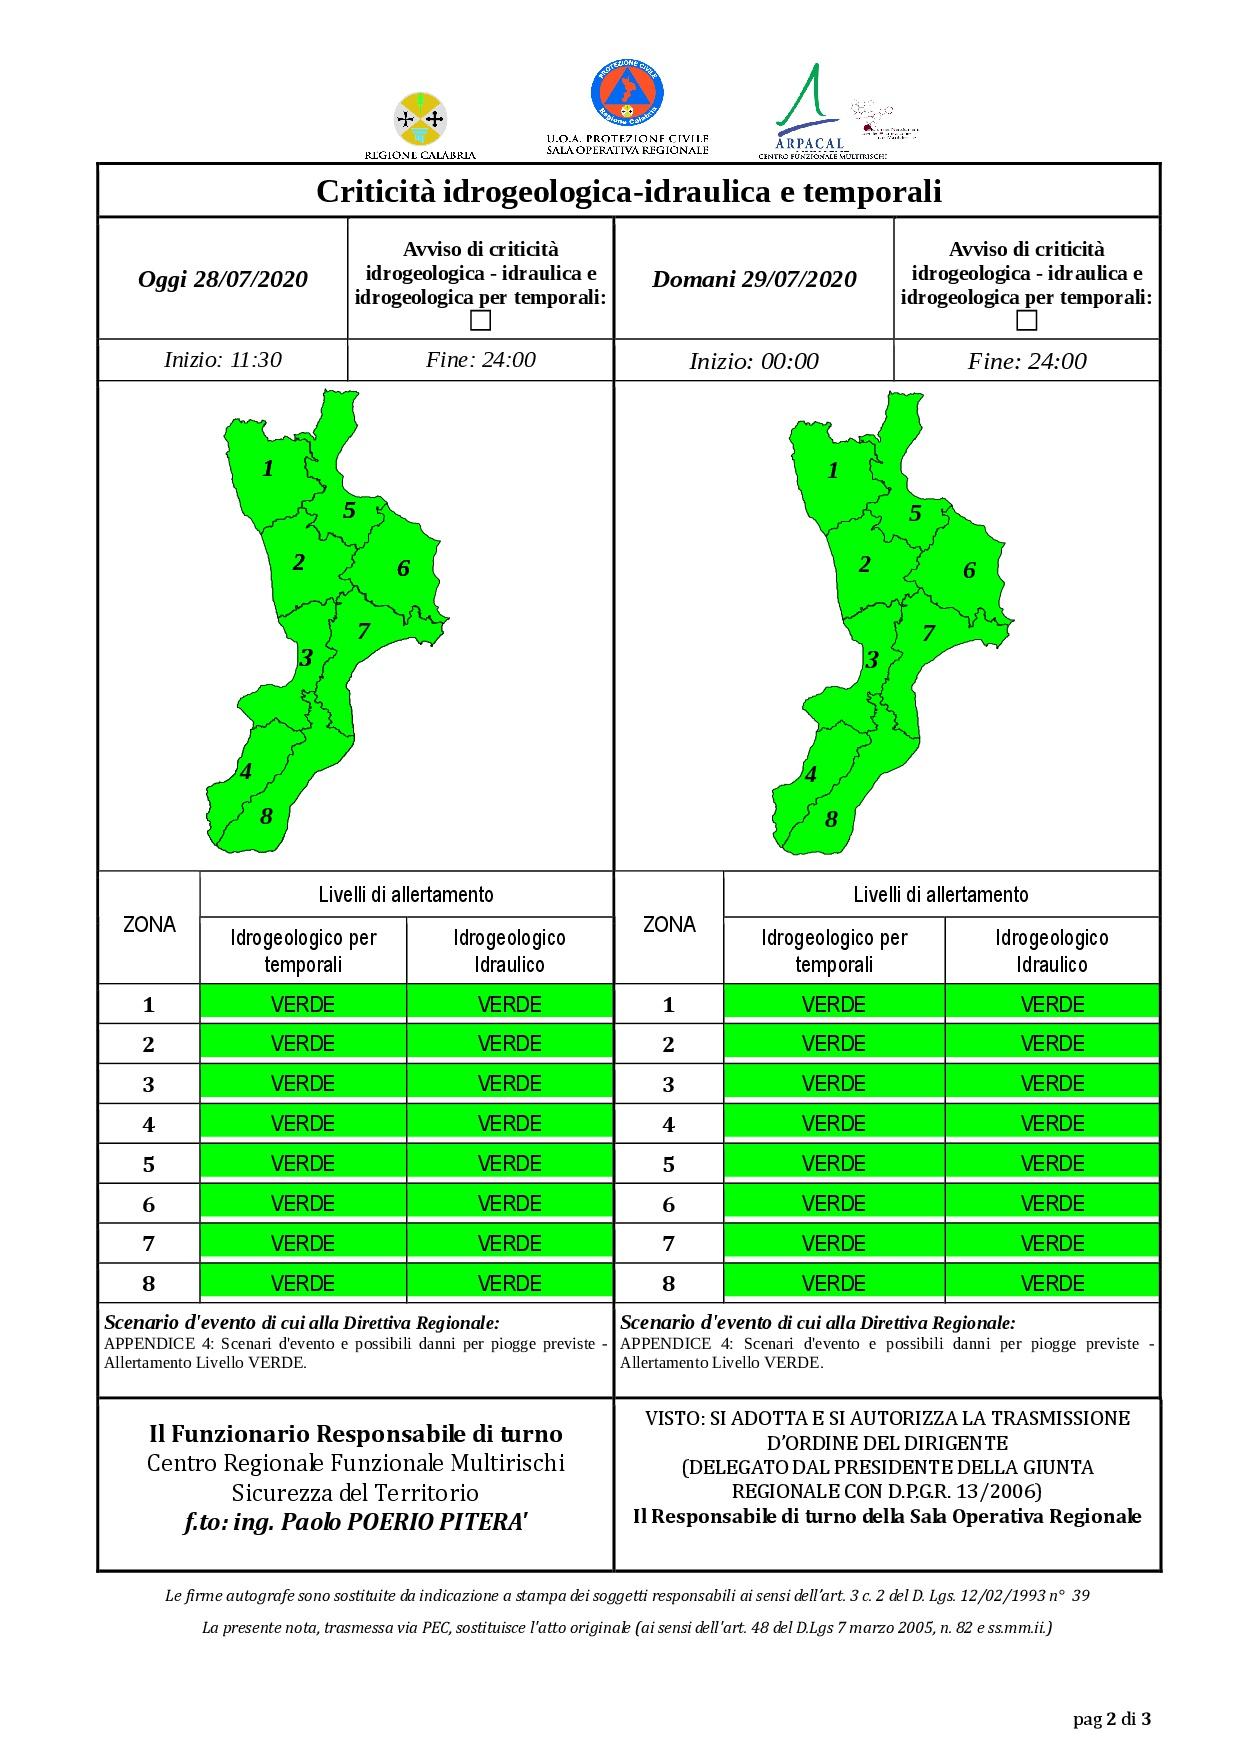 Criticità idrogeologica-idraulica e temporali in Calabria 28-07-2020